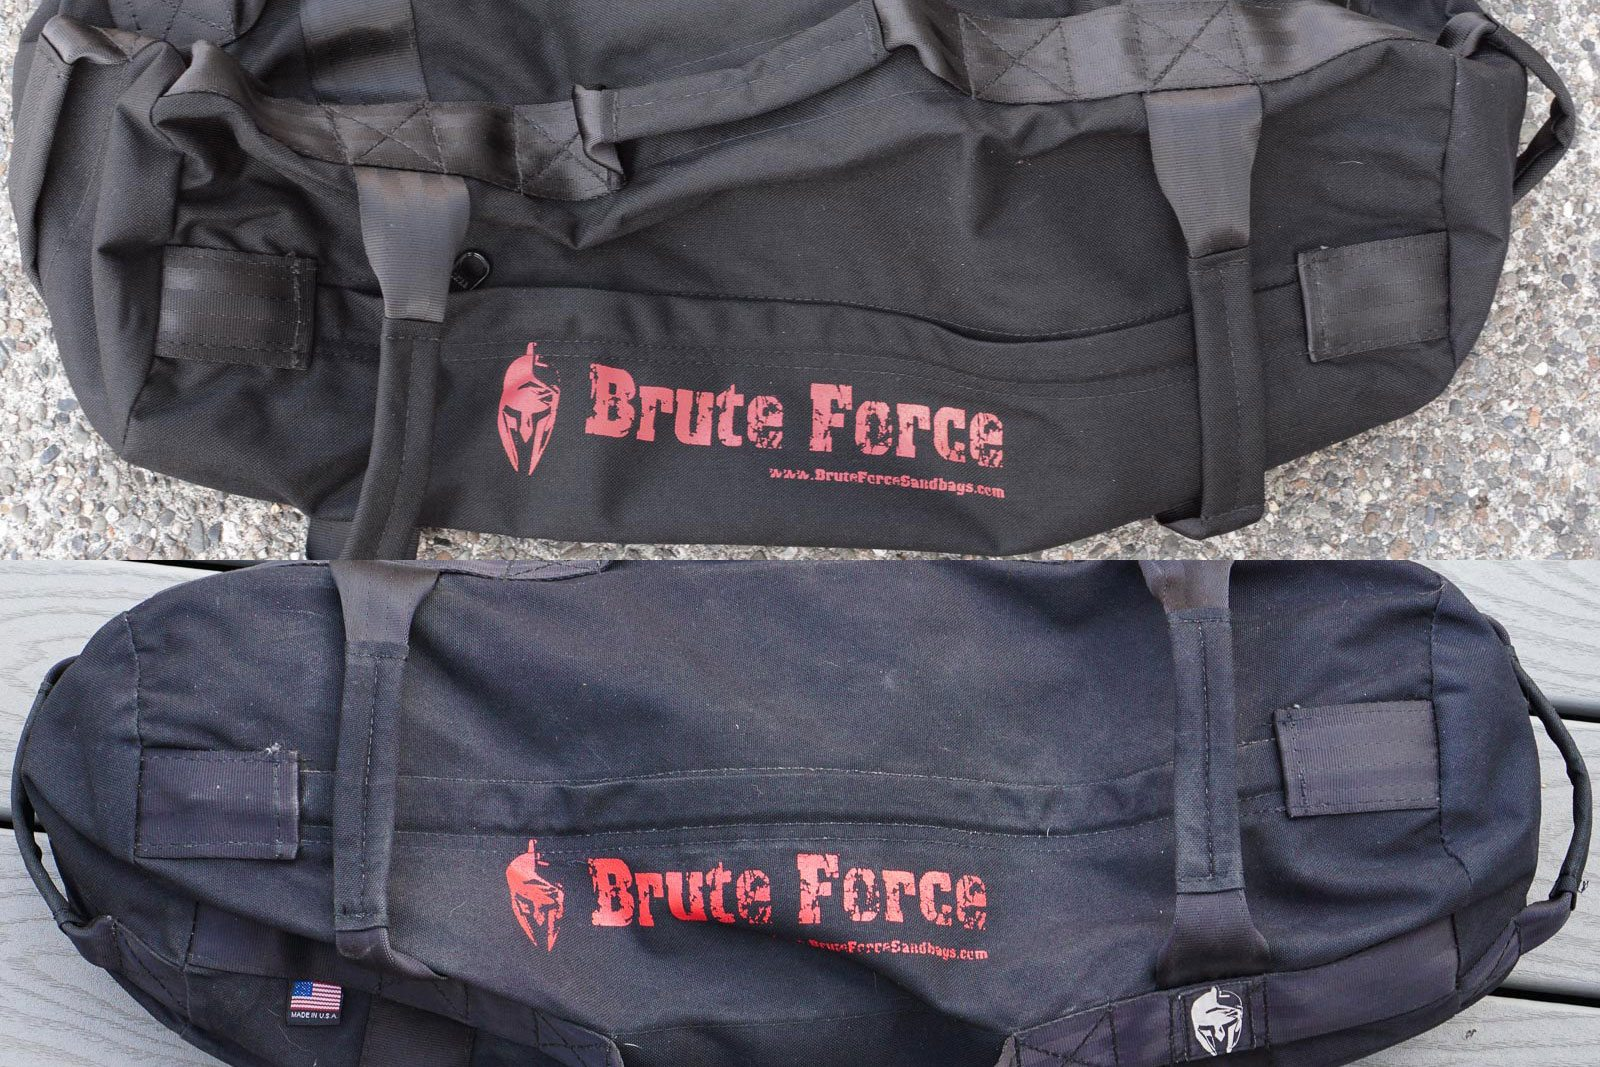 Brute-Force-Athlete-Sandbag---Old-vs-New